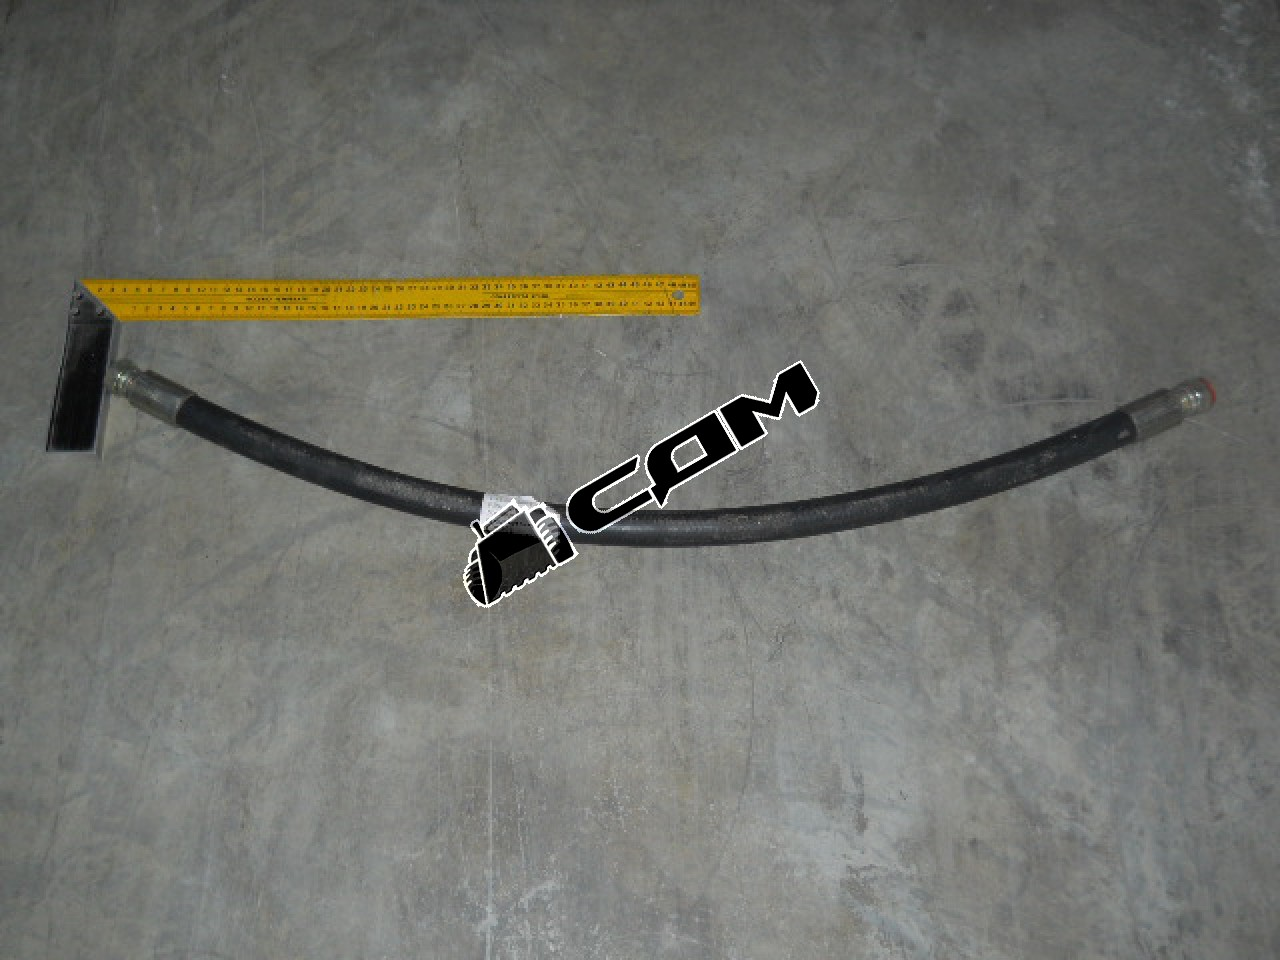 РВД  на цилиндр поворота промежуточный CDM833 2-16-21/830/Г27/Г27